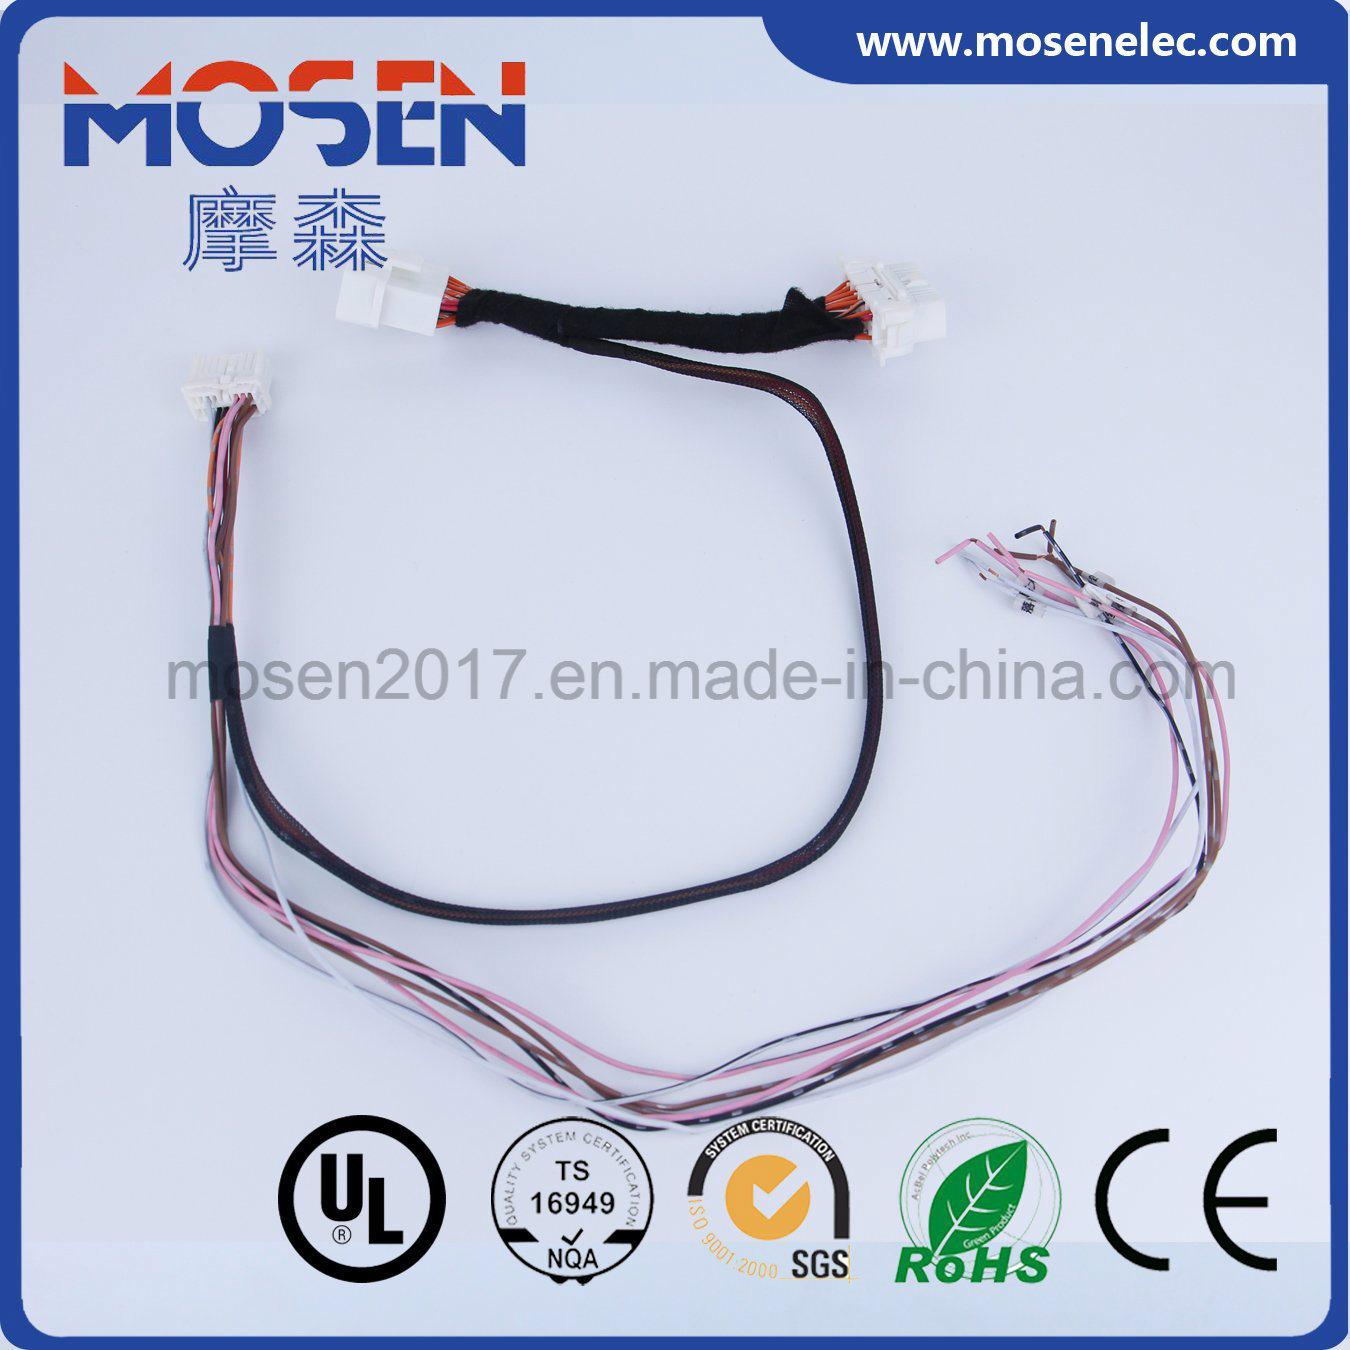 hight resolution of china toyota nissan mazda kia hyundai pke system obd connector wiring harness china obd harness pke harness